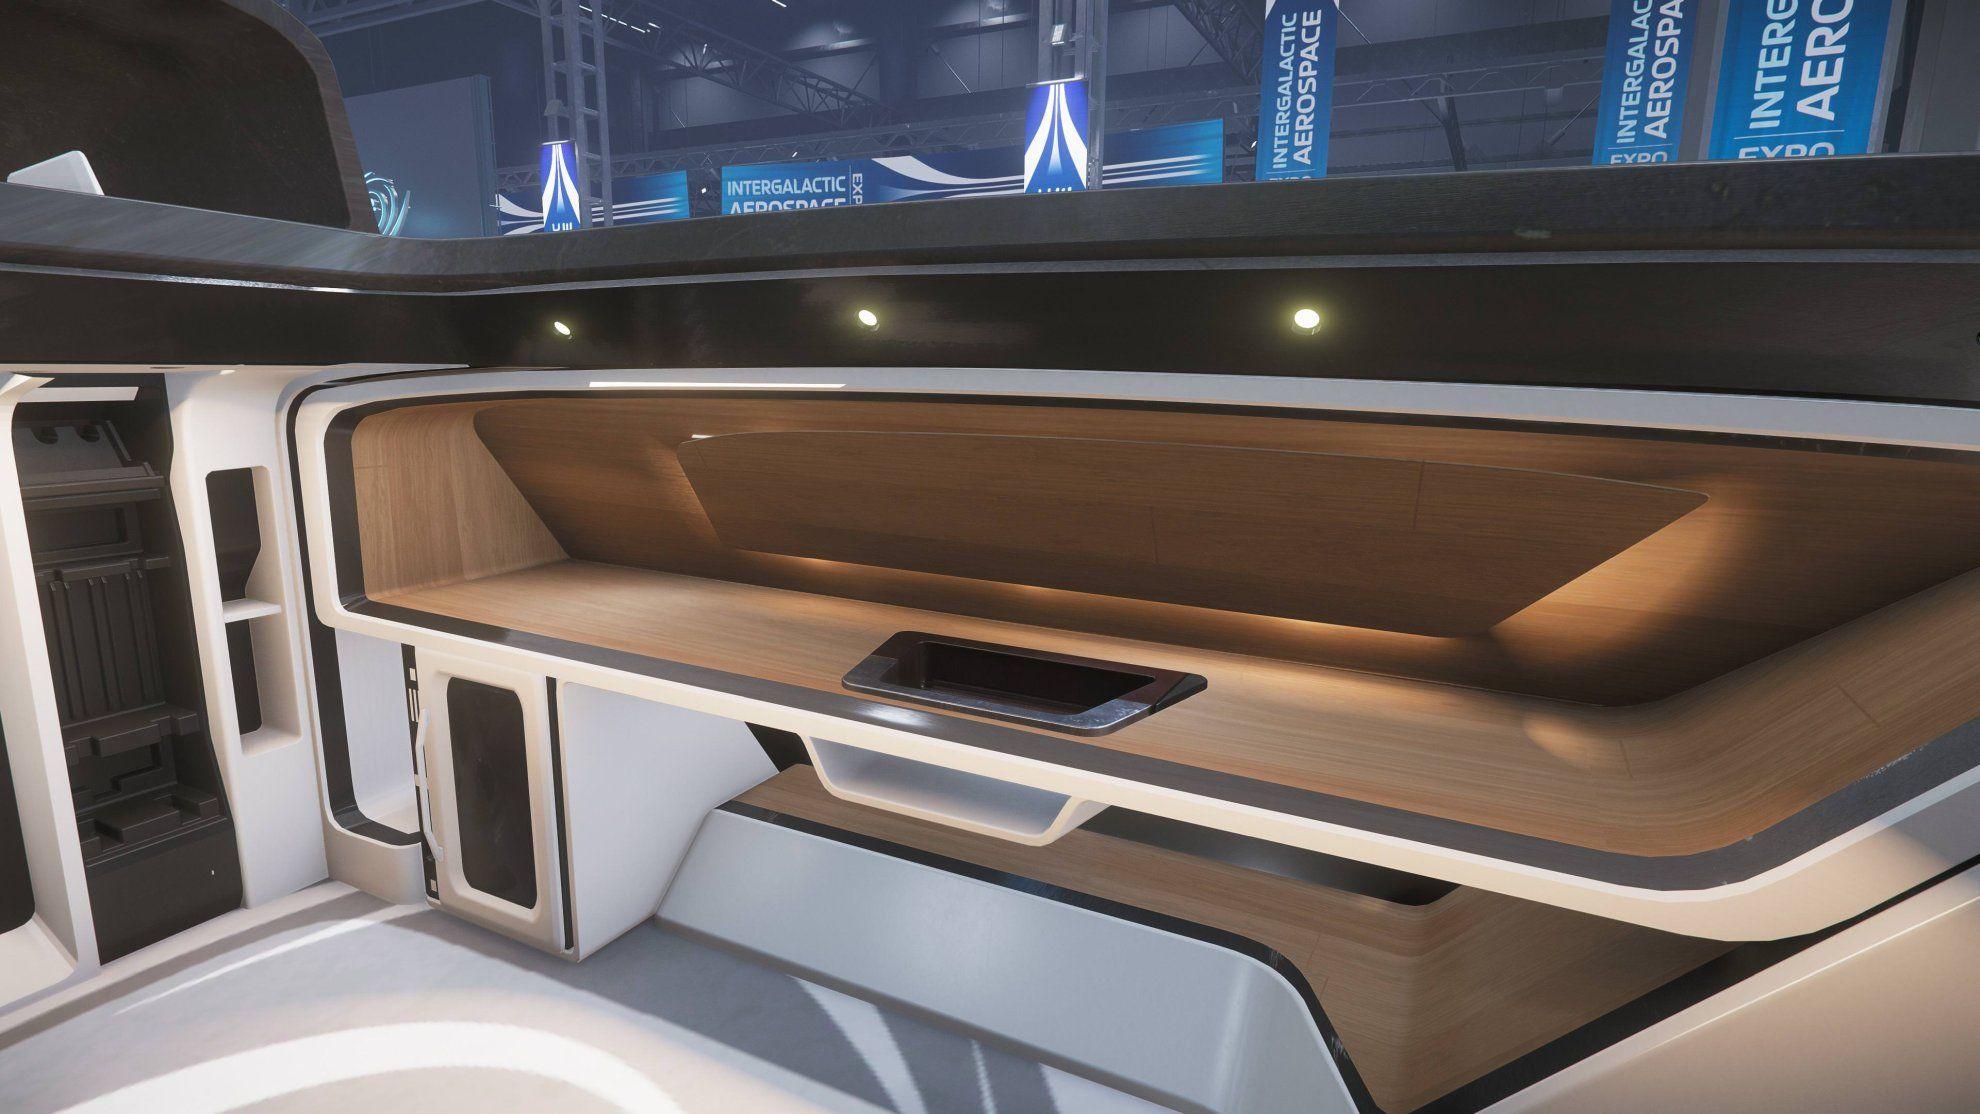 Origin 300i - Expo 2948